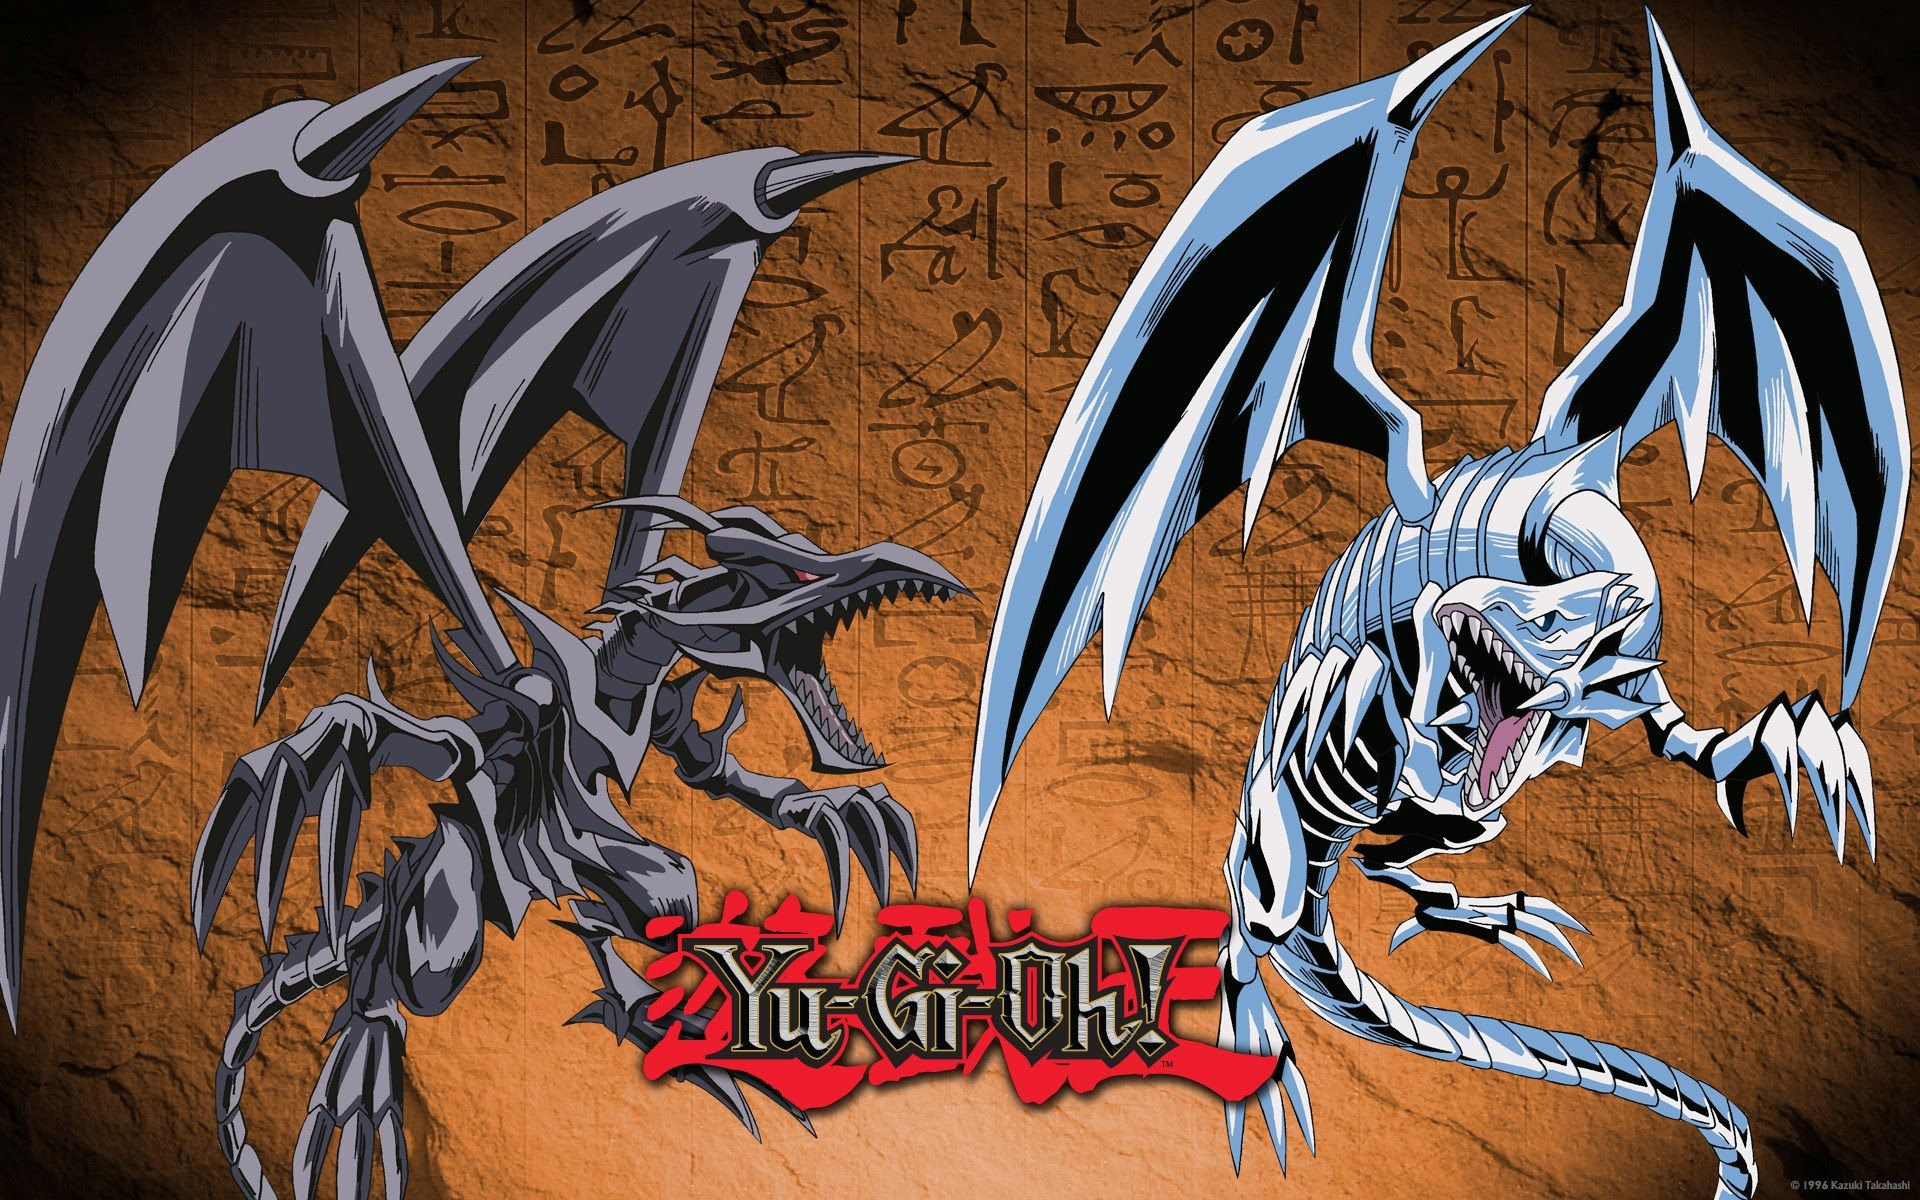 Yu Gi Oh Images Red Eyes Black Dragon Vs Blue Eyes White Dragon Hd White Dragon Black Dragon Anime Black Hair